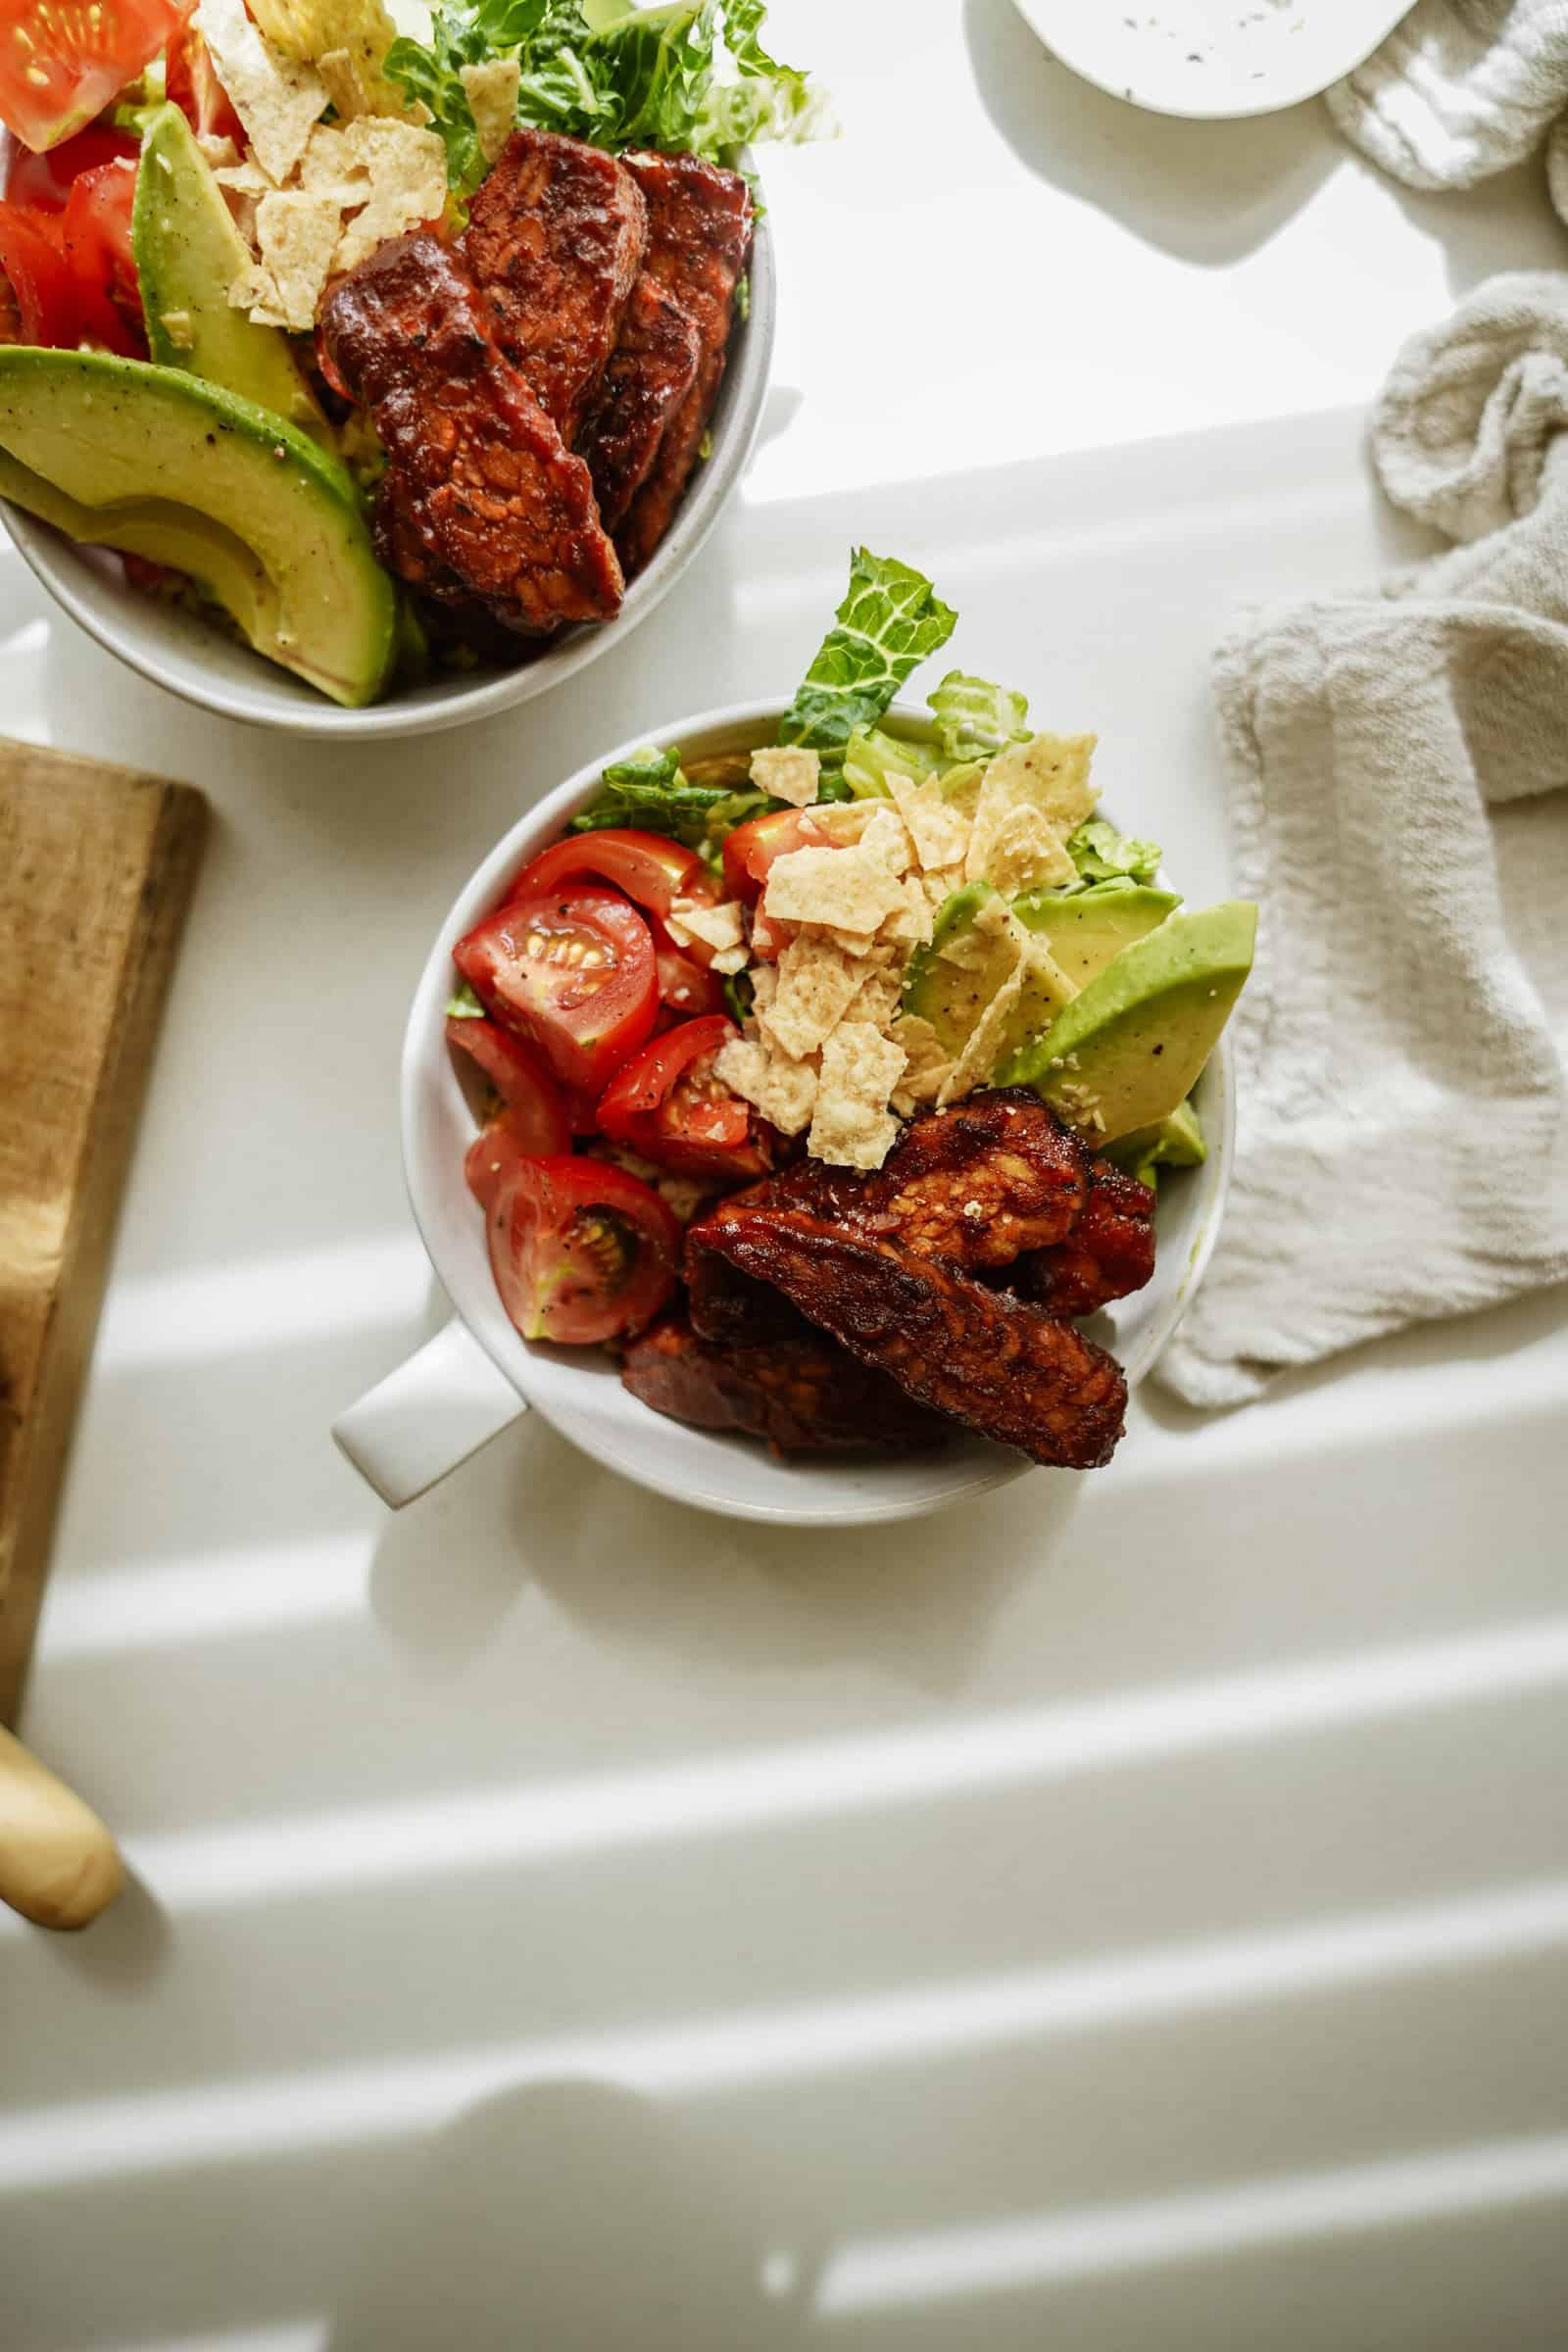 BBQ tempeh bowl with fresh veggies in a bowl